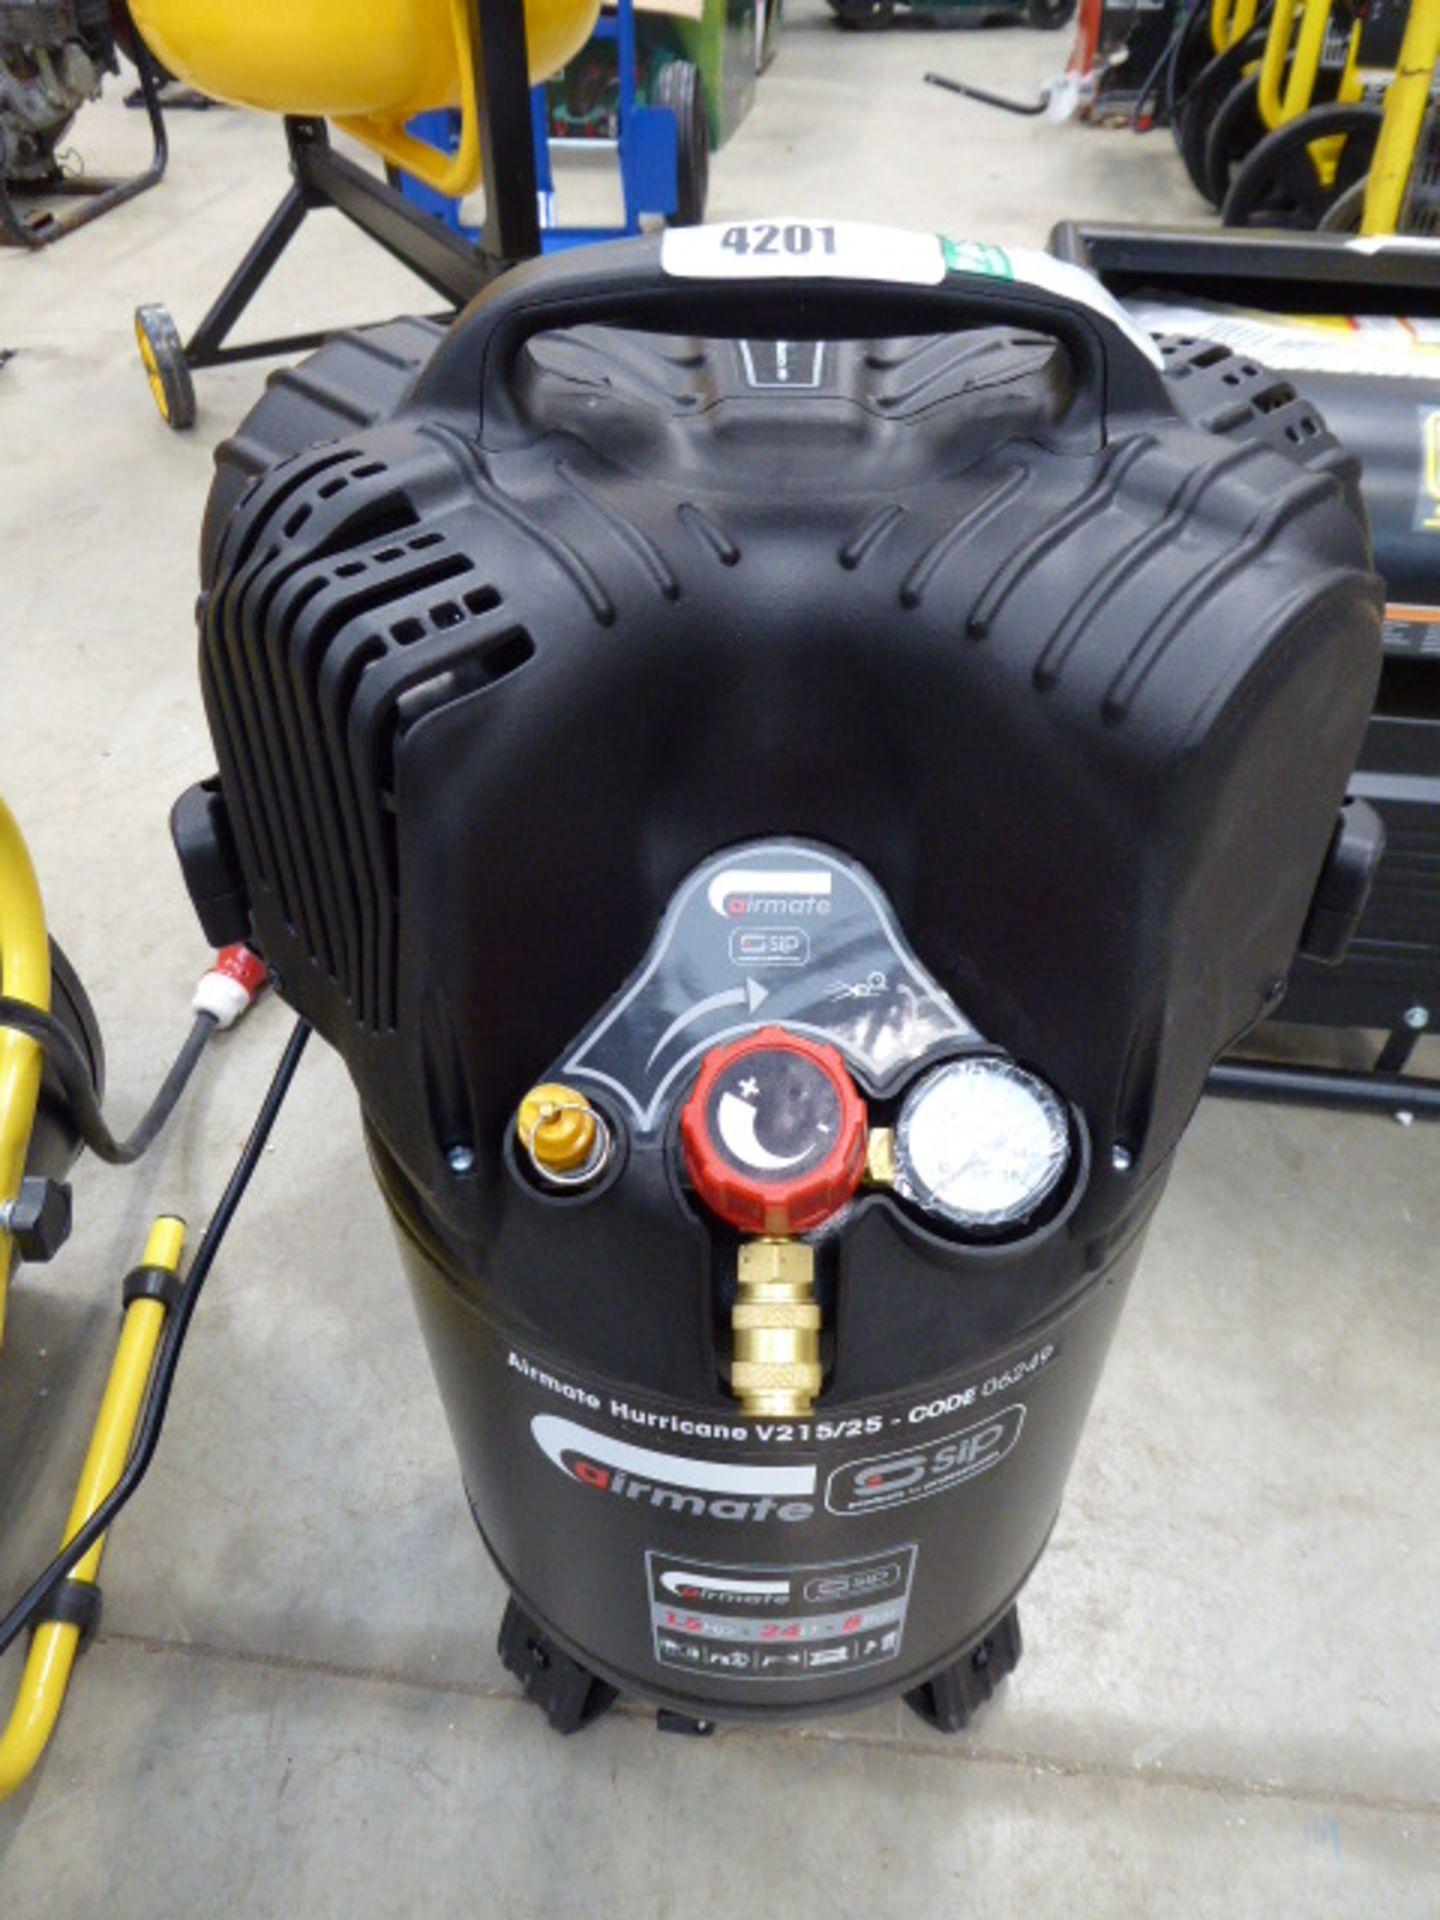 Small SIP 24 litre upright compressor